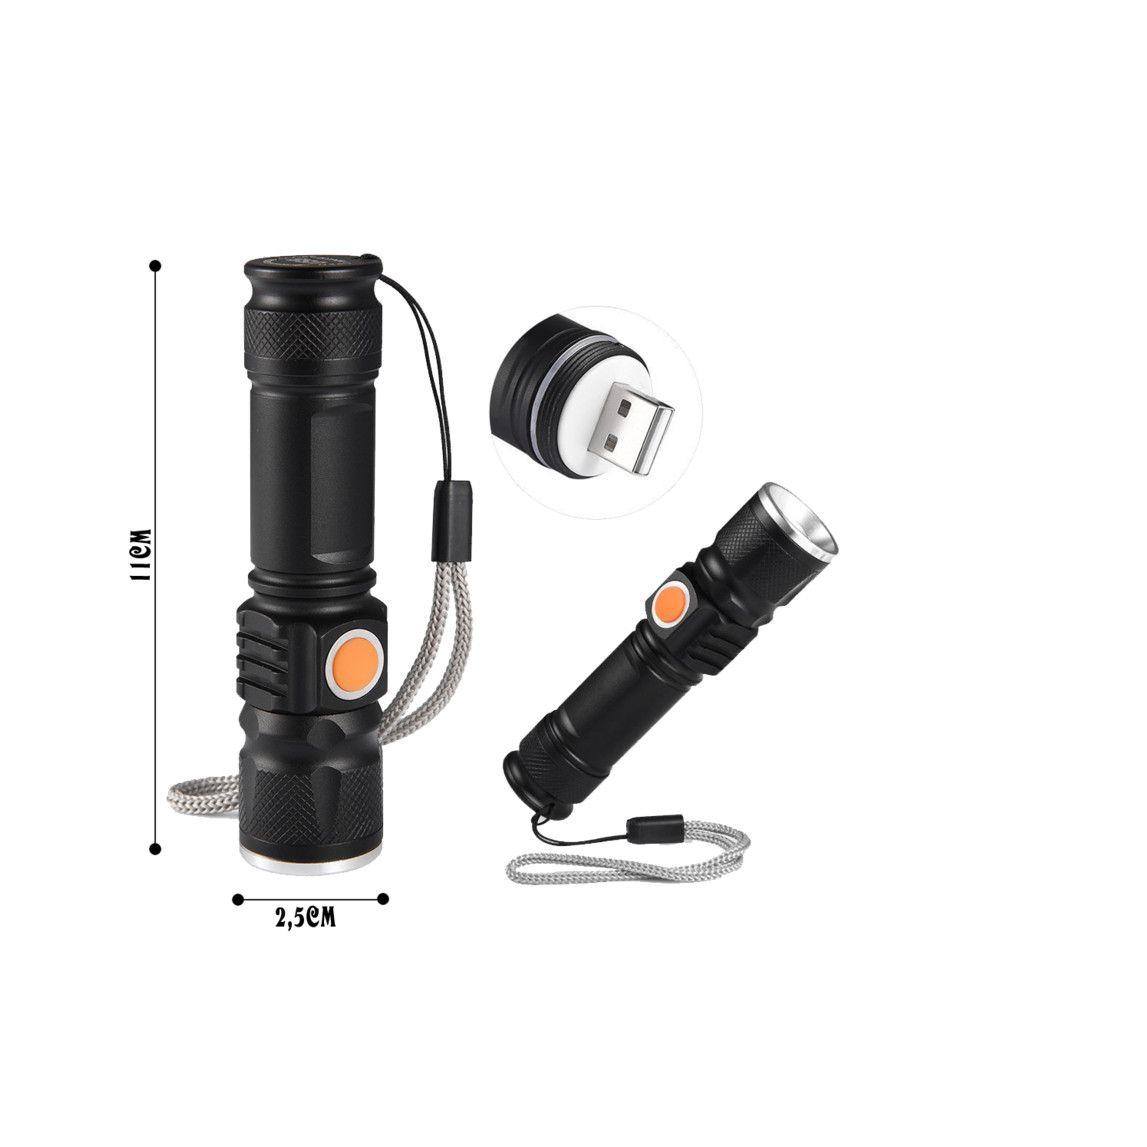 Lanterna cu acumulator si incarcare USB Electric Torch pret